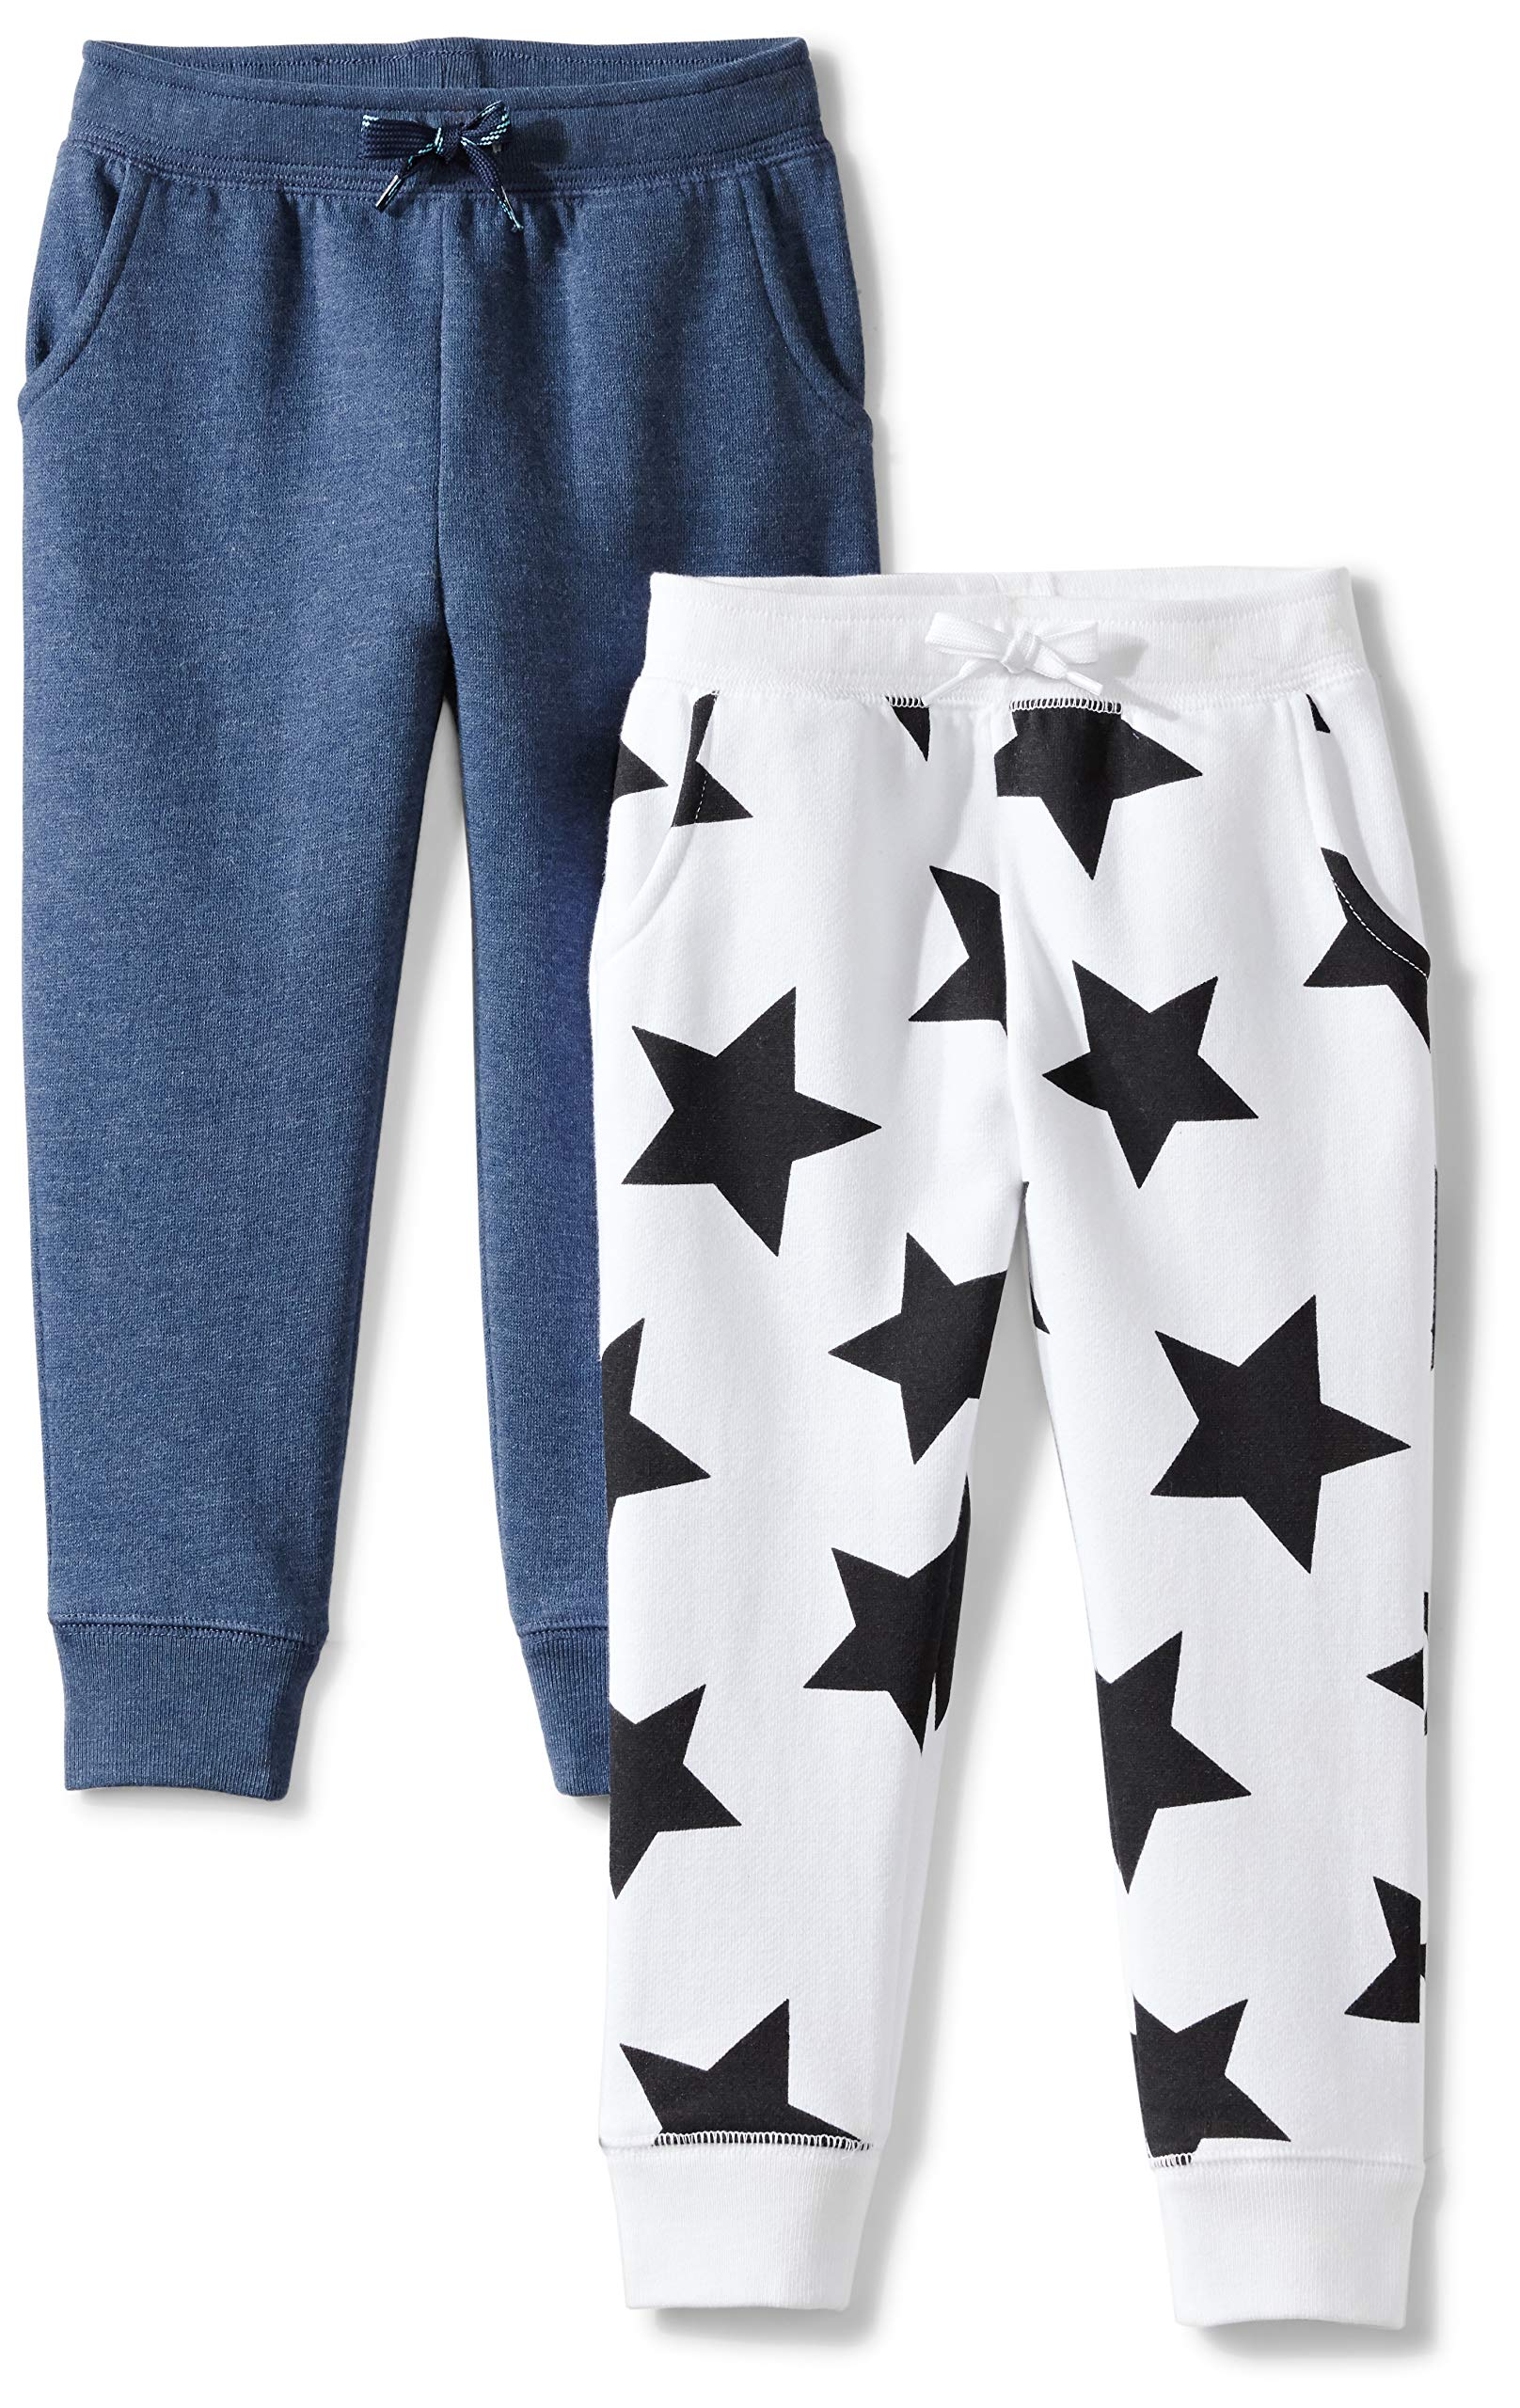 Amazon Brand - Spotted Zebra Girls' Little Kid 2-Pack Fleece Jogger Pants, Star/Blue, Small (6-7)